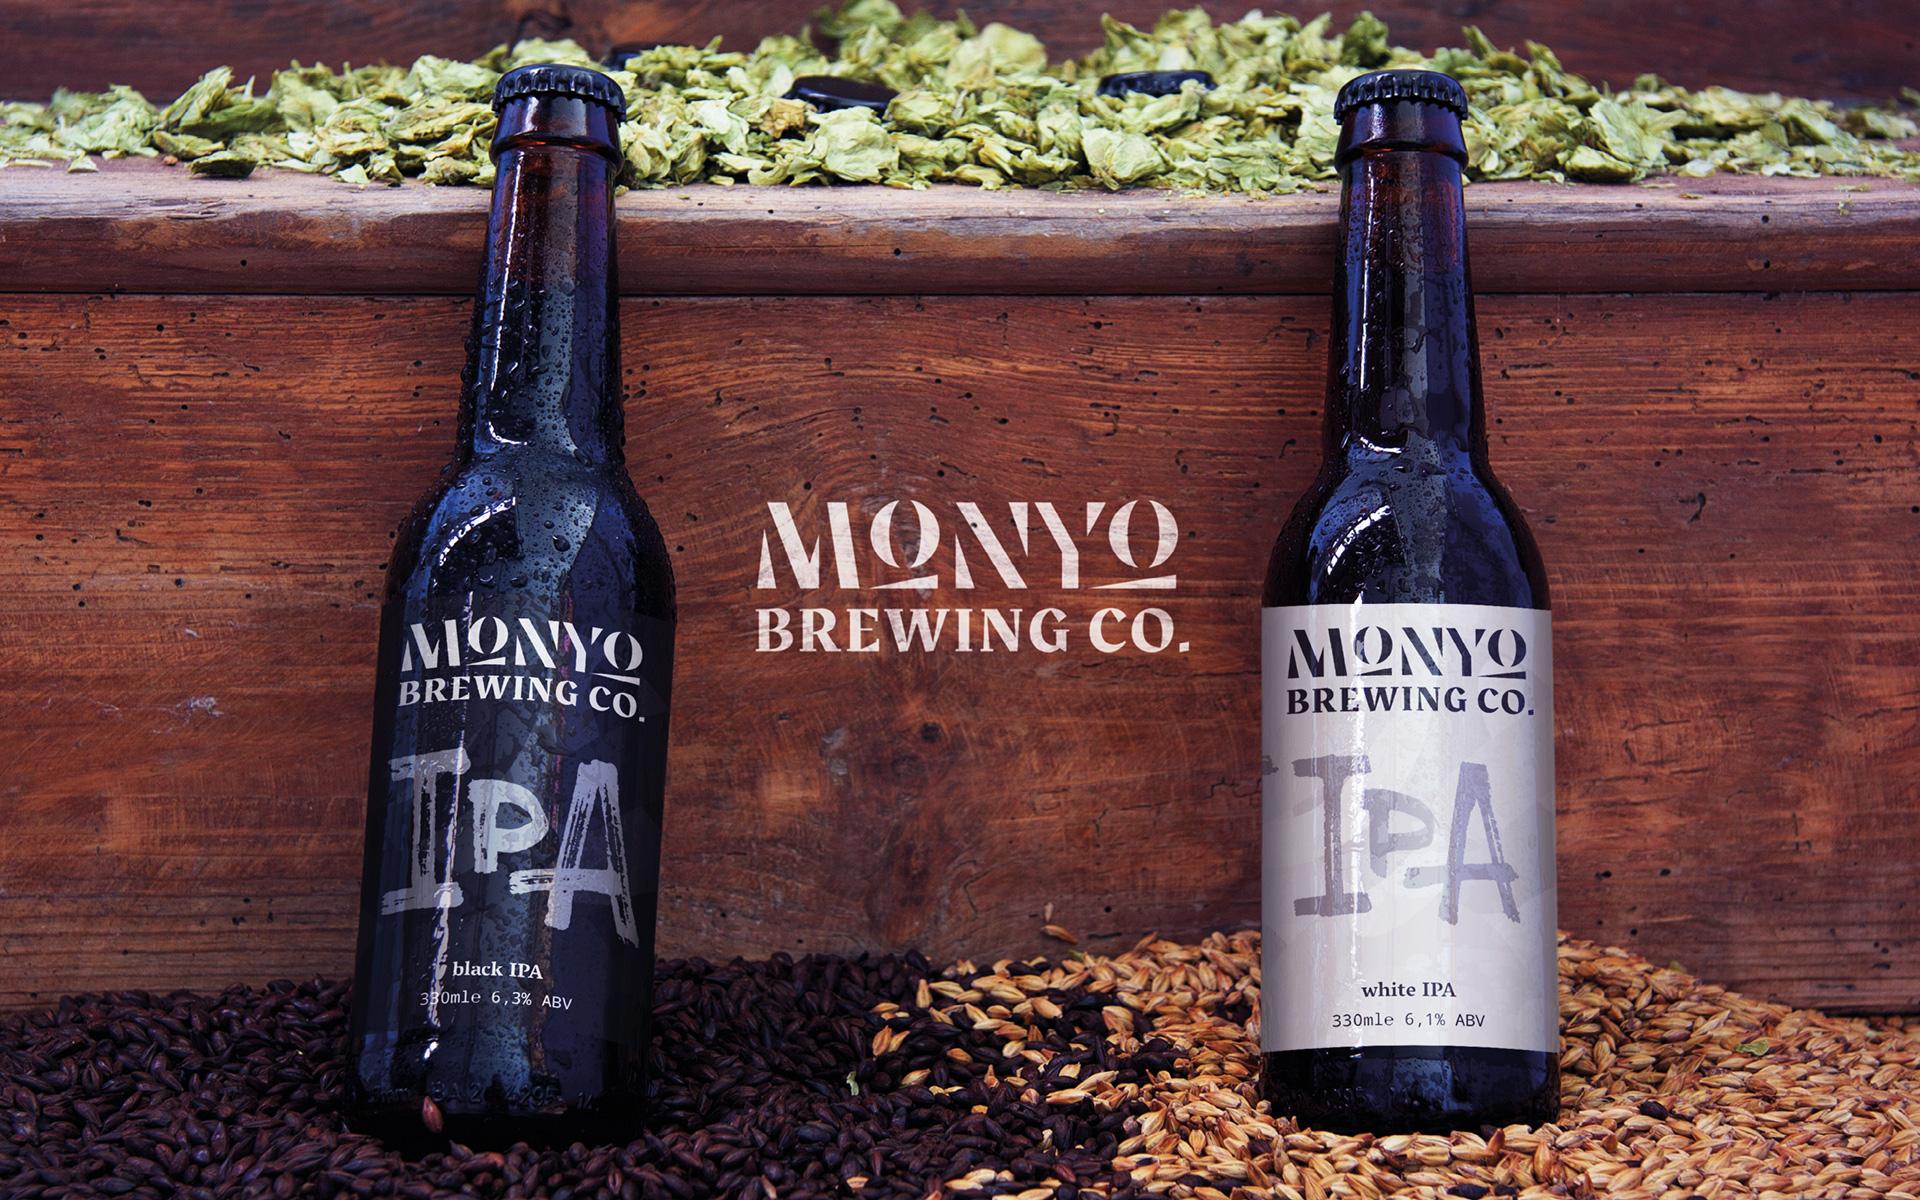 MONYO craft beer packaging \ Black IPA nad White IPA